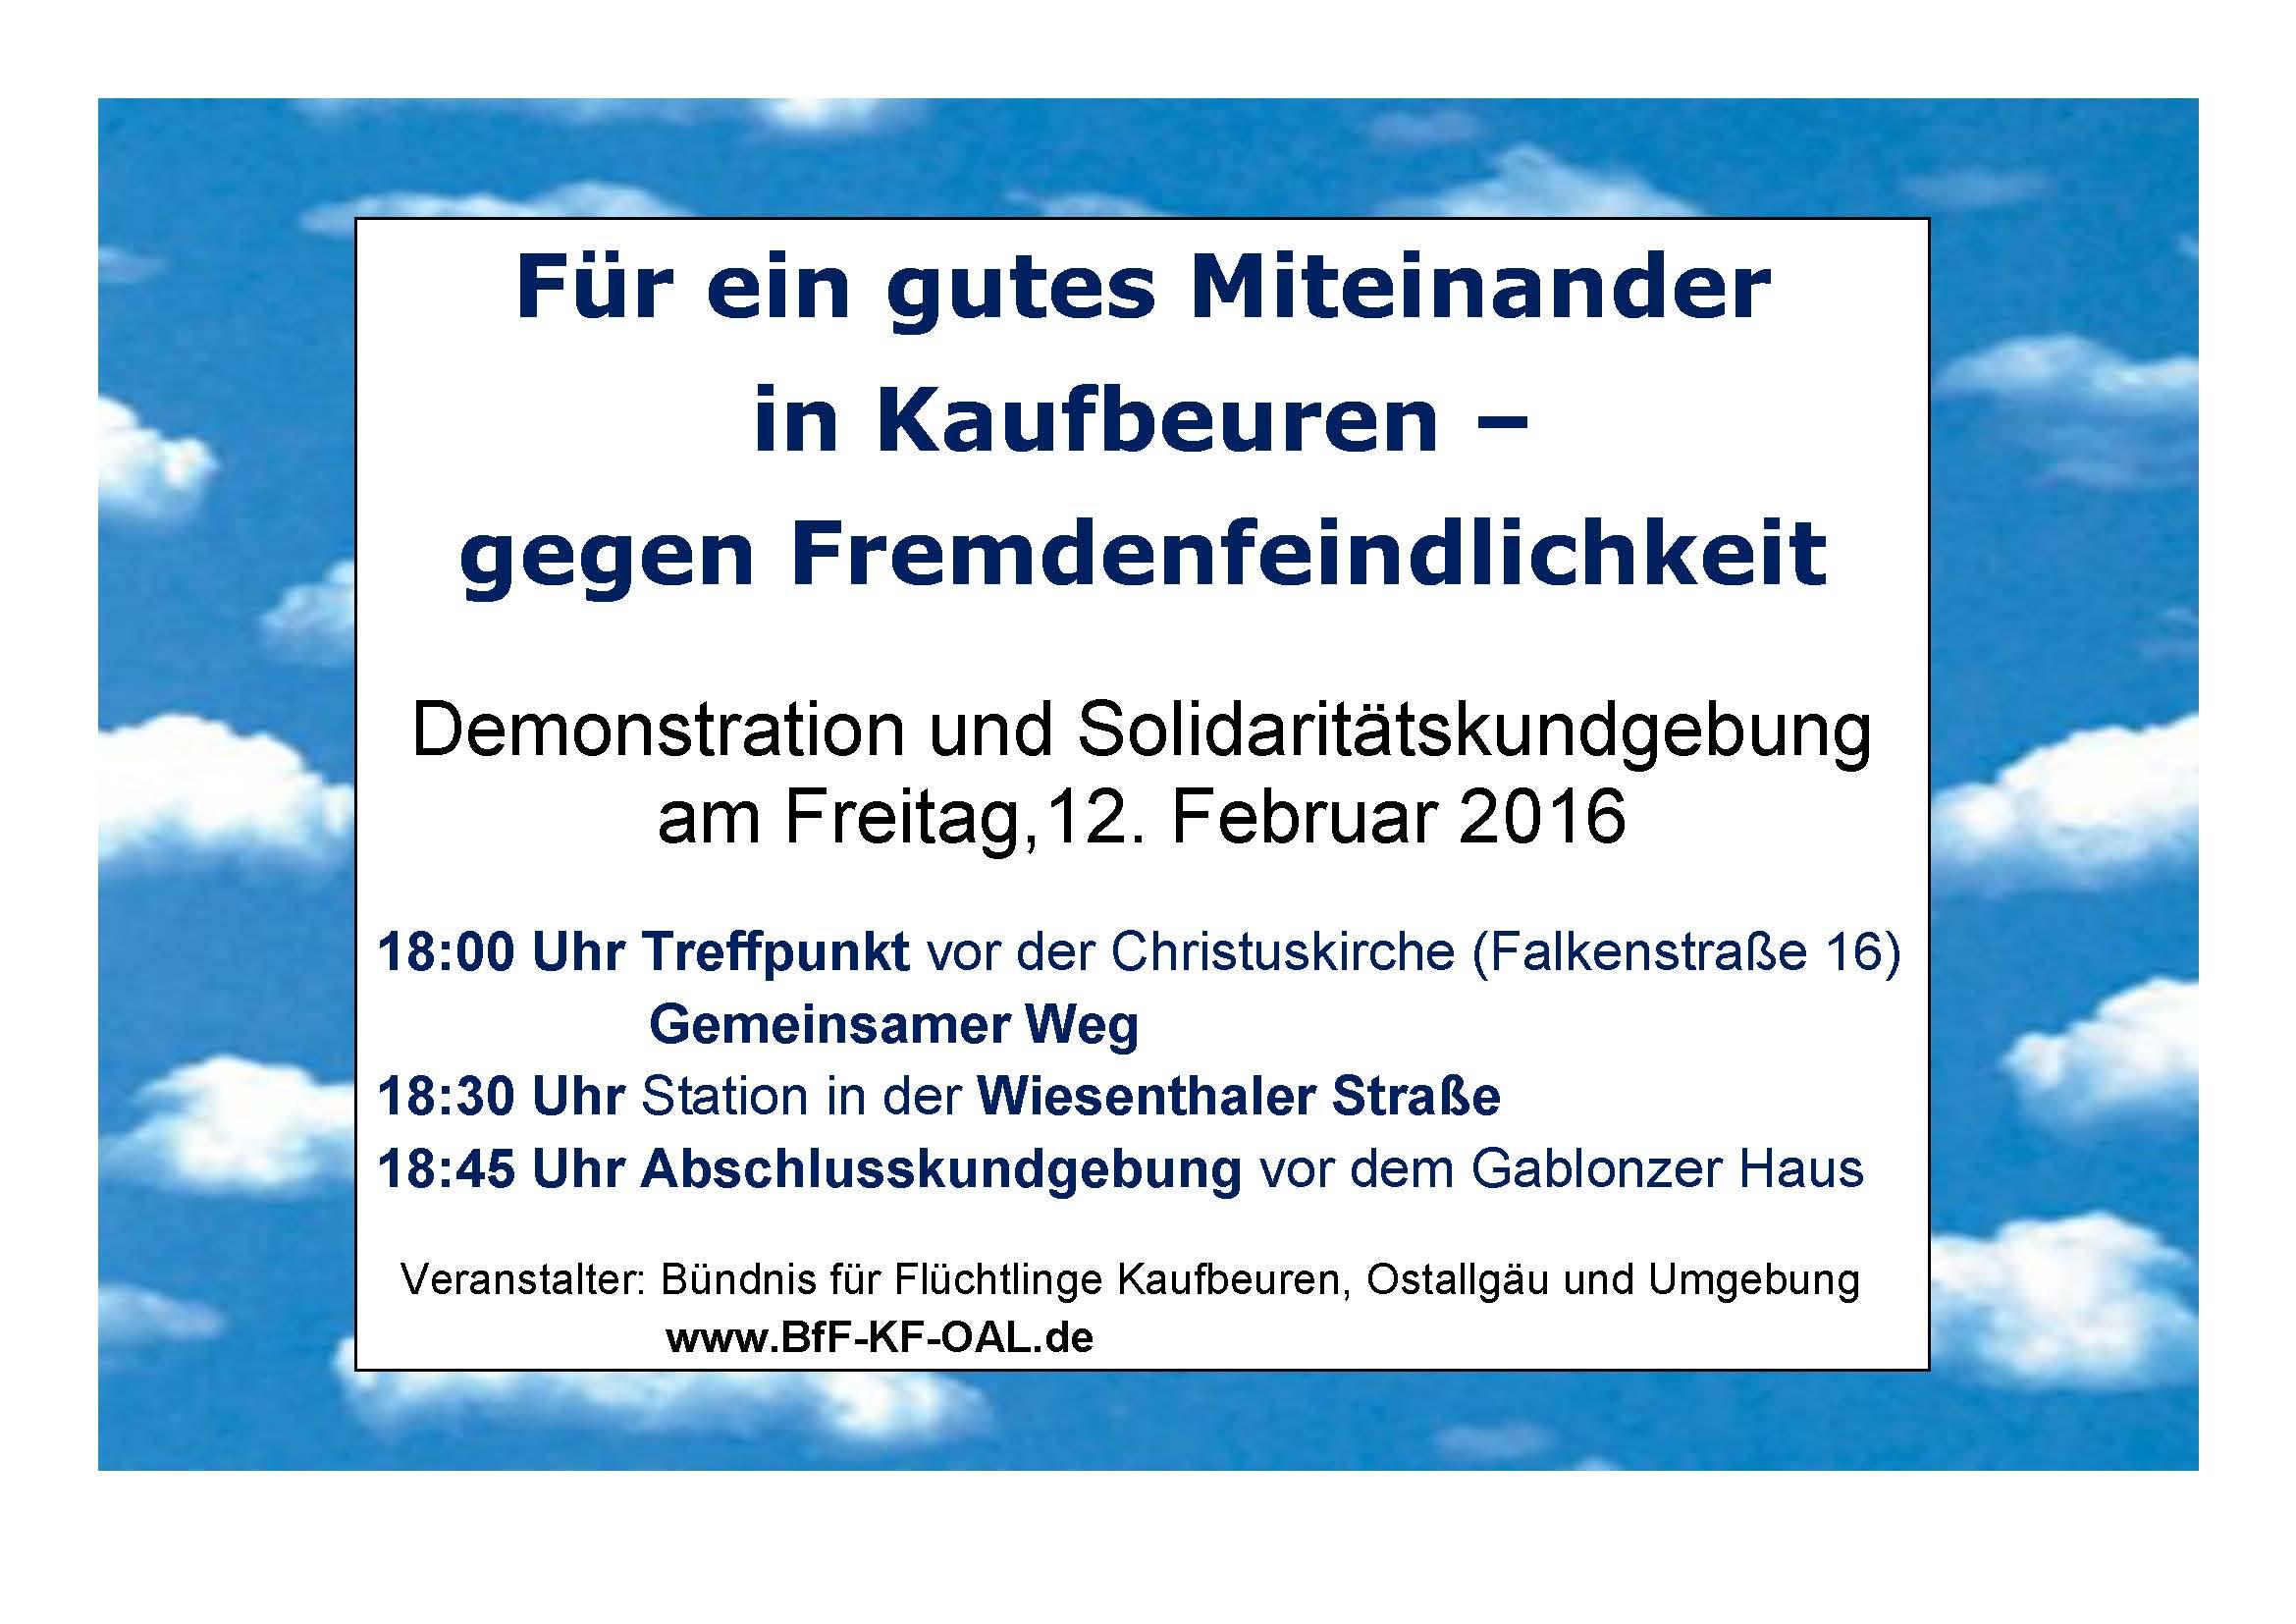 Demo und Solidaritätsbekundung